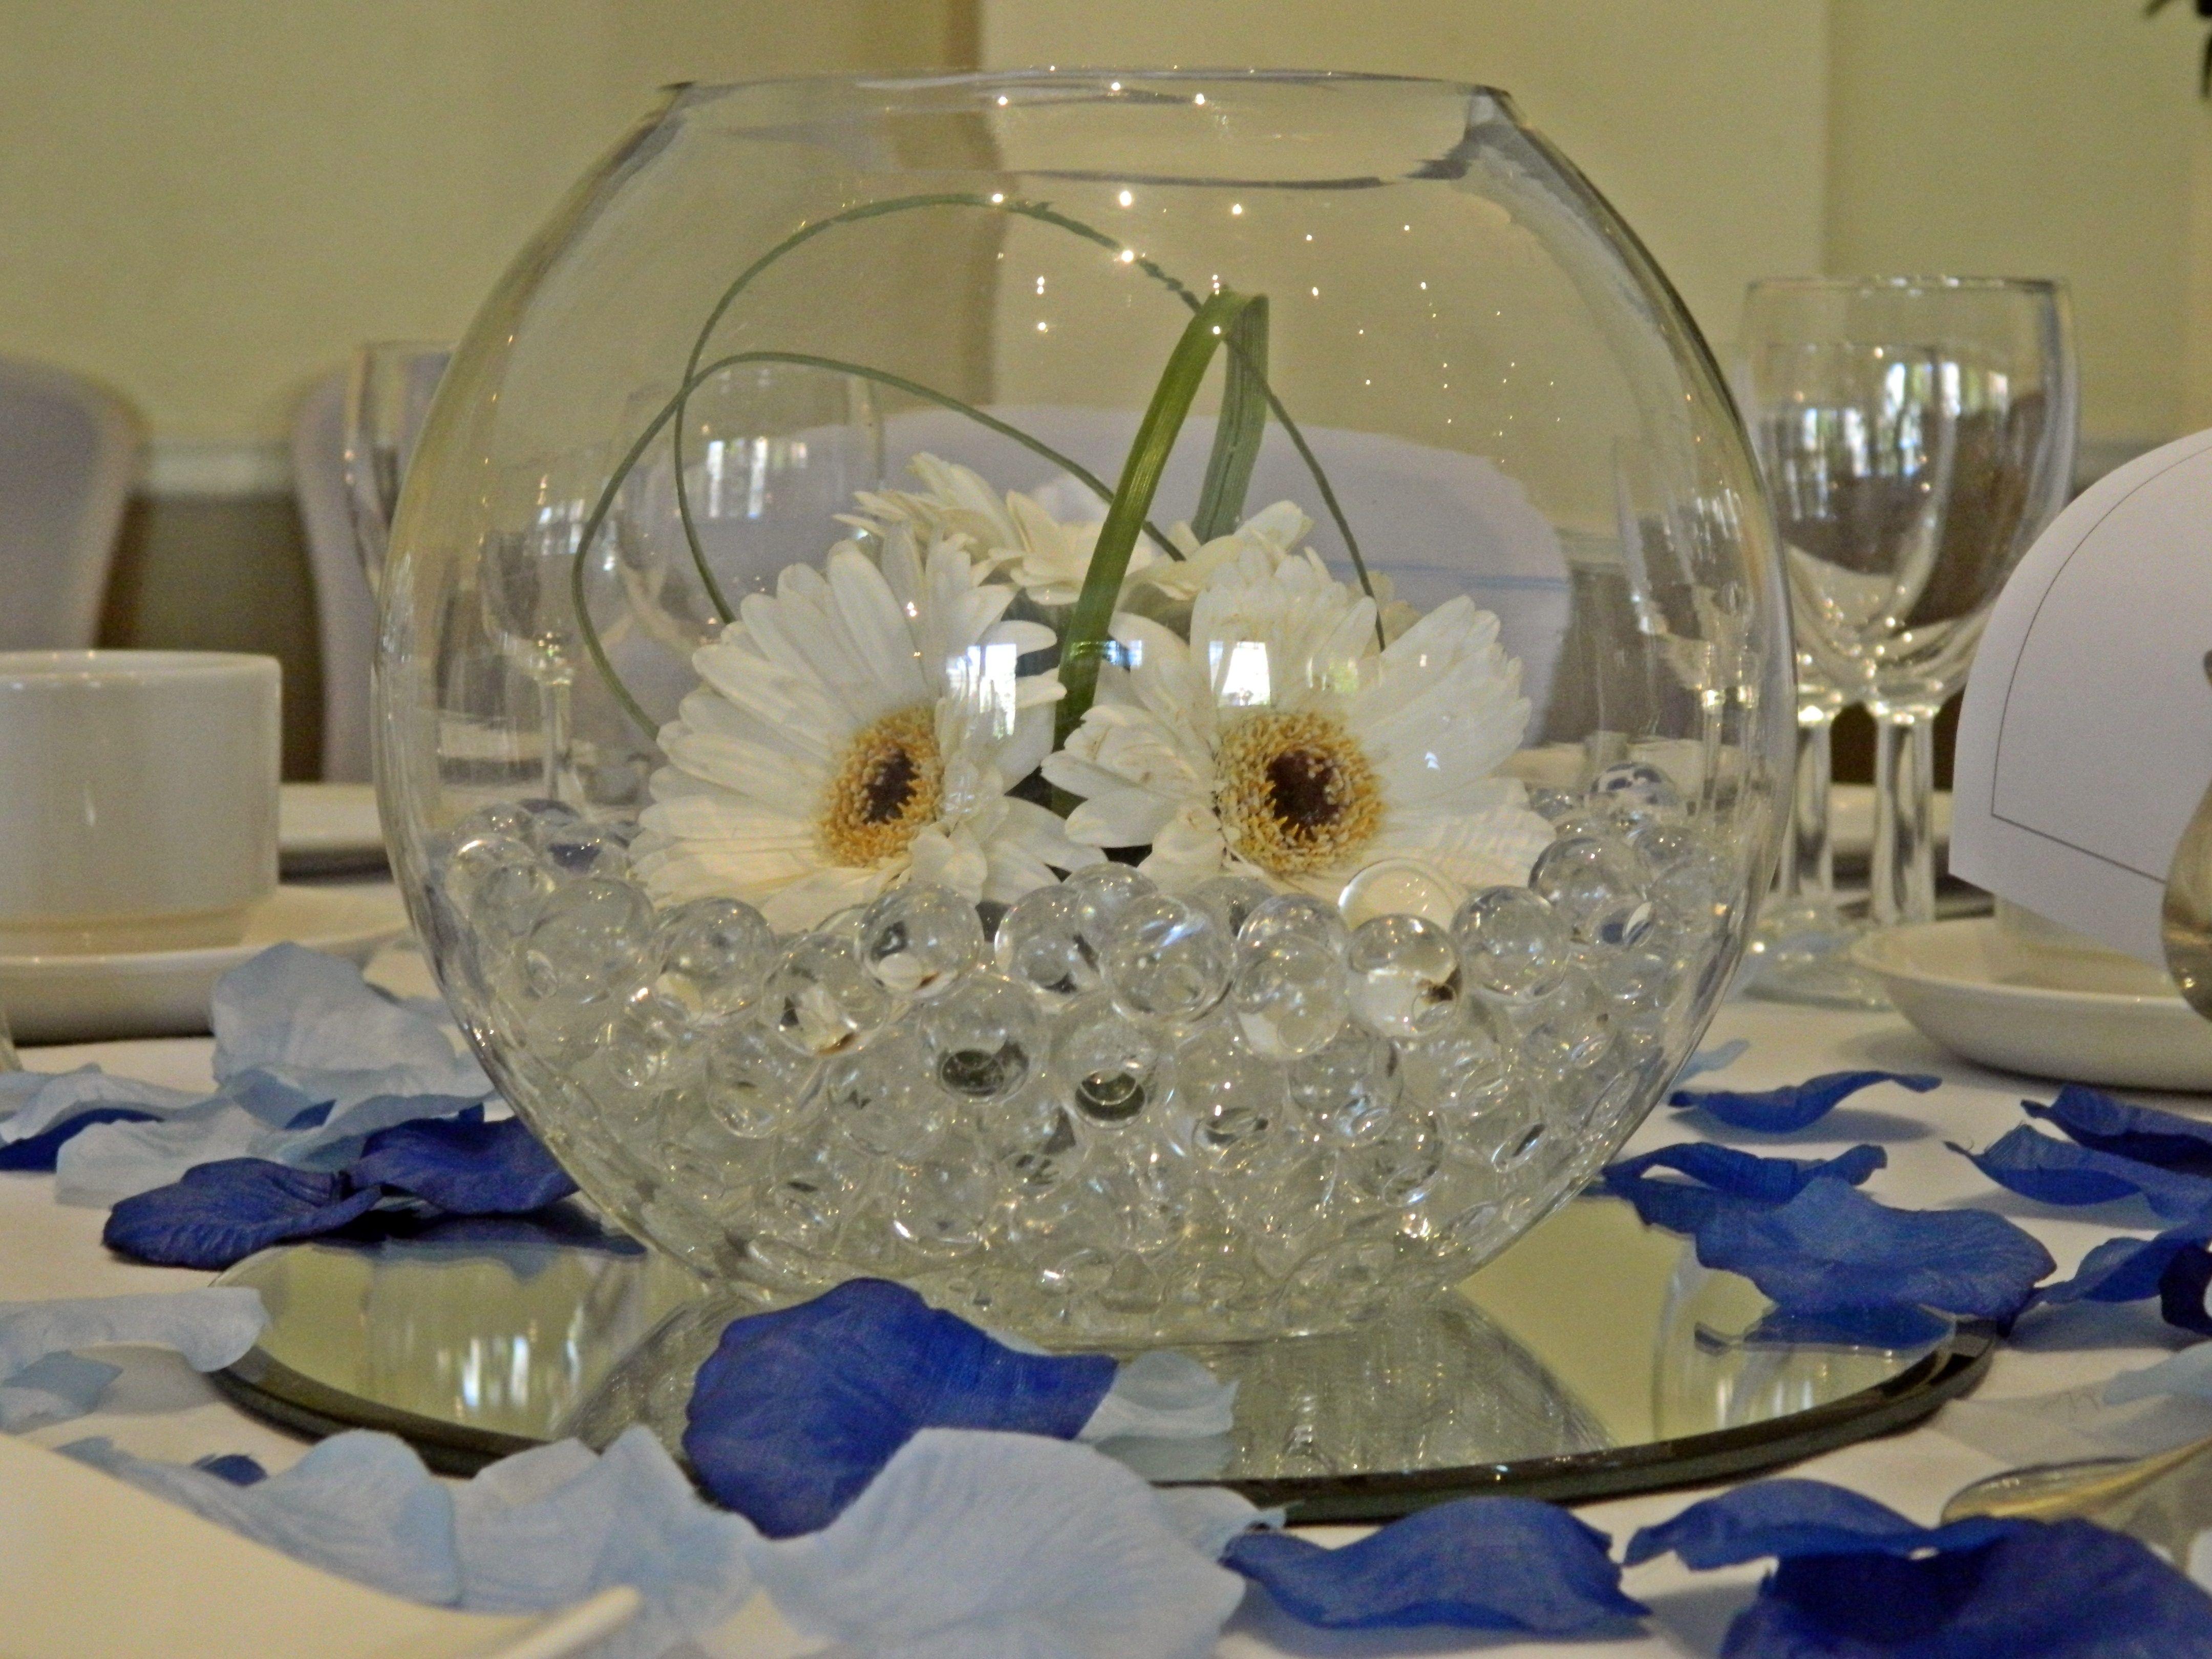 Fish bowl bubble bowl centerpiece tigerlily with purple for Fish bowl centerpieces ideas